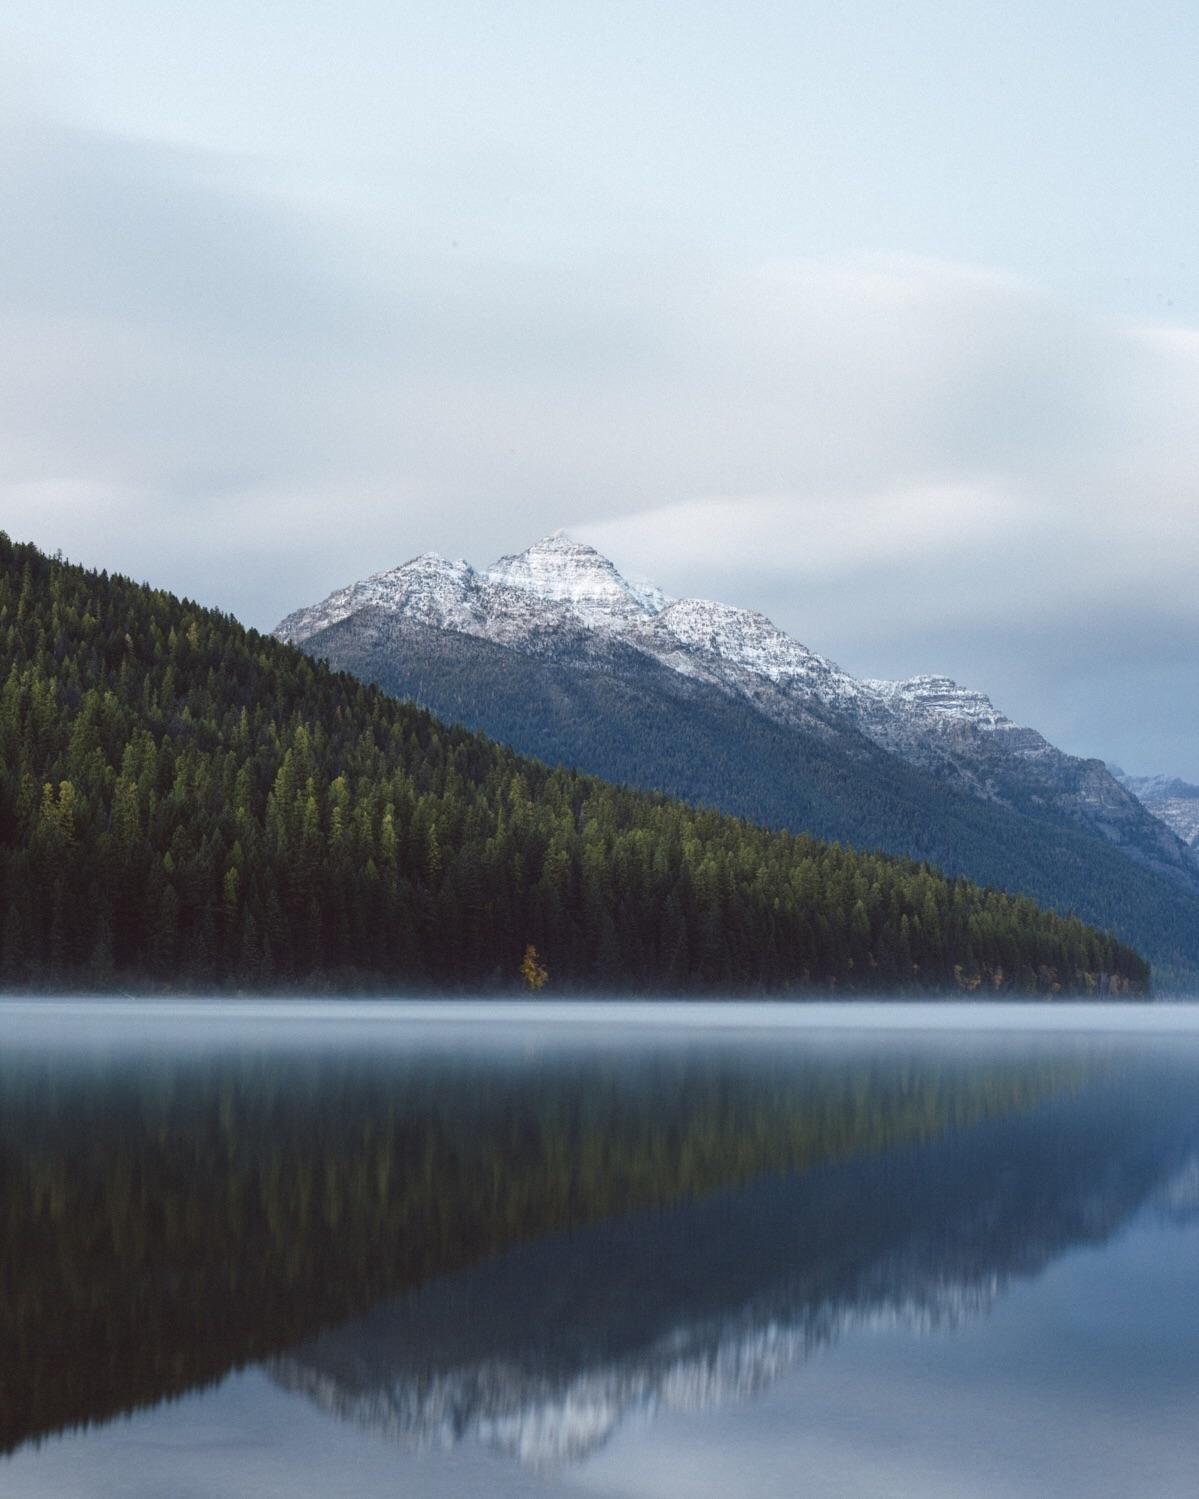 Morning fog on bowman lake in northwest montana x